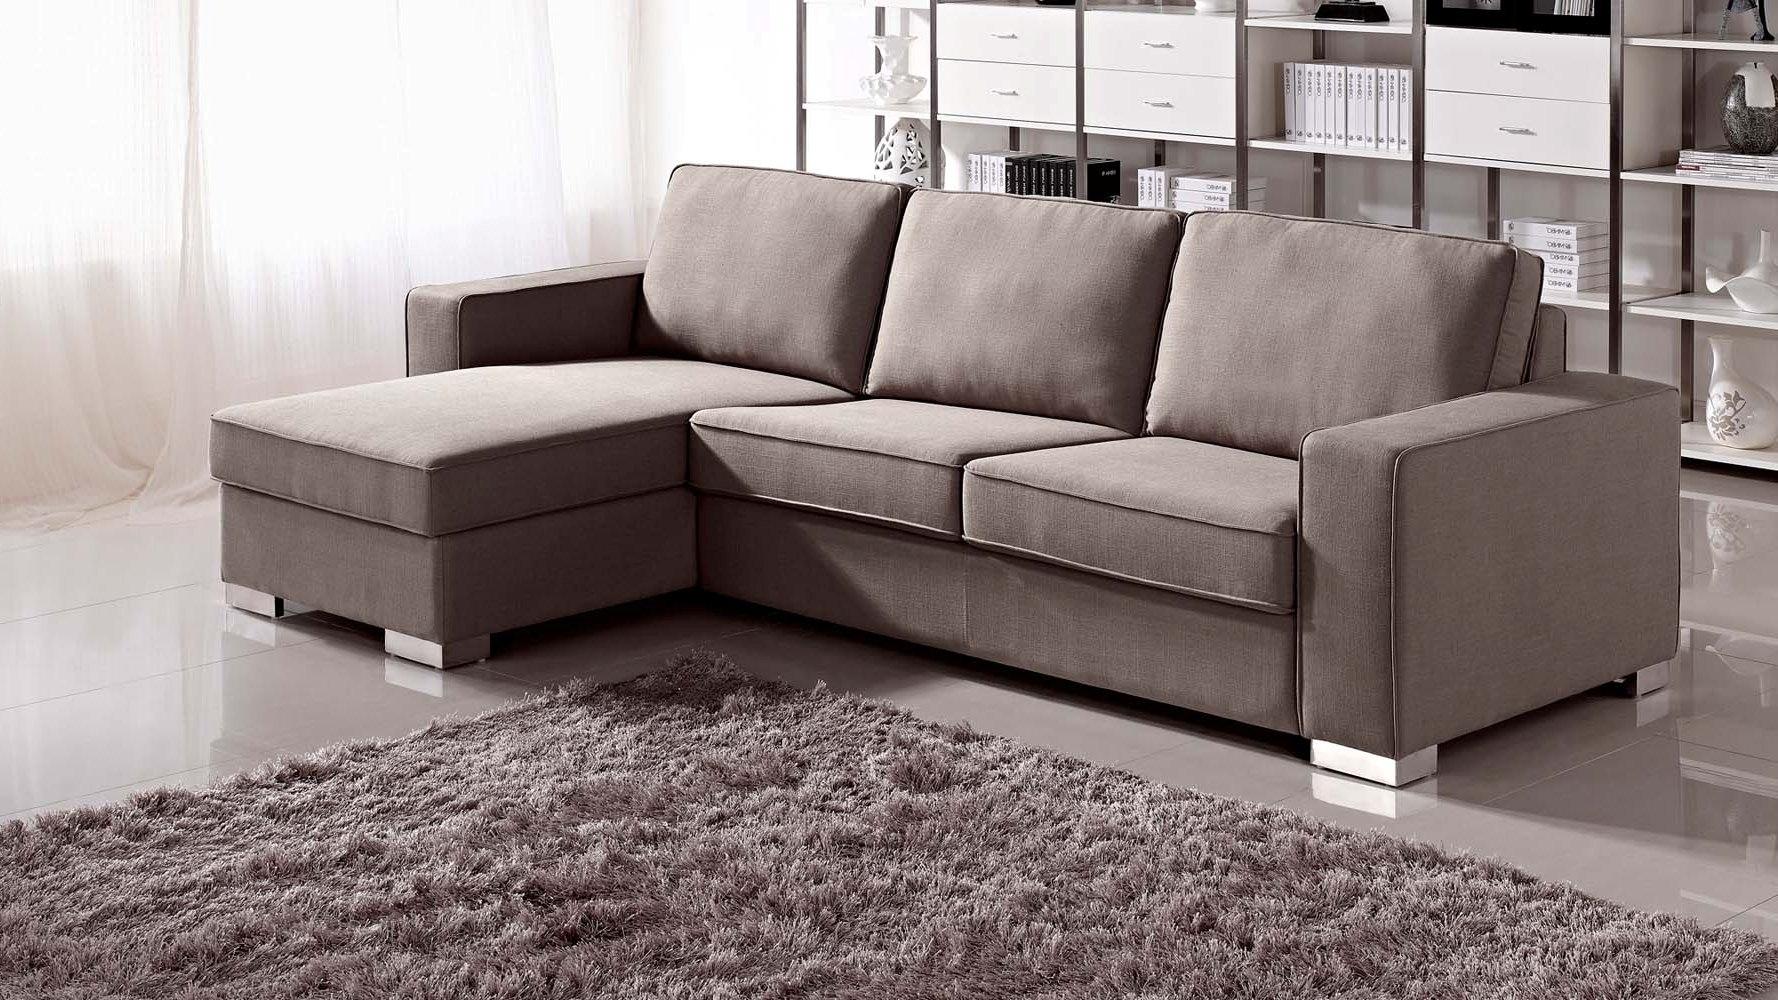 Sears Sectional Sofa | Sears Sectional Sofa Canada | Sears Sectional With Regard To Sears Sectional Sofas (View 10 of 10)